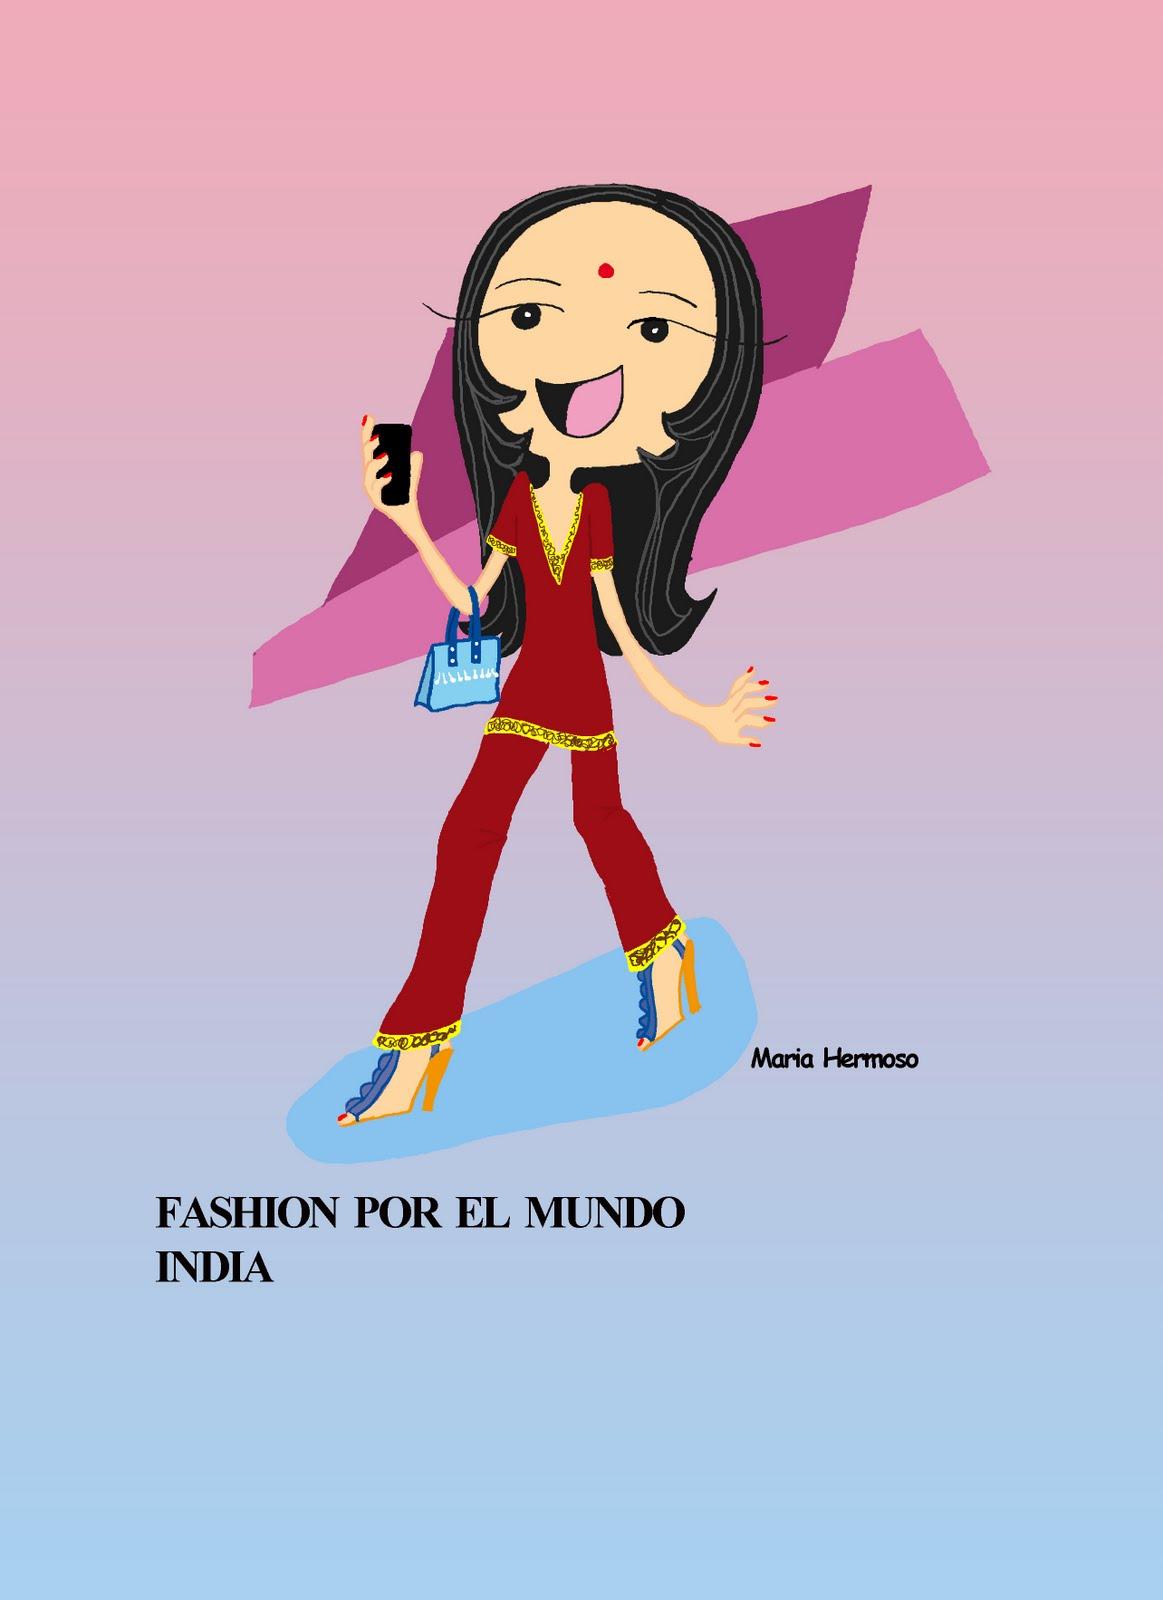 http://4.bp.blogspot.com/-Locwn1qM14o/TYNKqhisHQI/AAAAAAAAPc4/Hw_Msz7svek/s1600/LamodaesBella-India-MariaHermoso.jpg